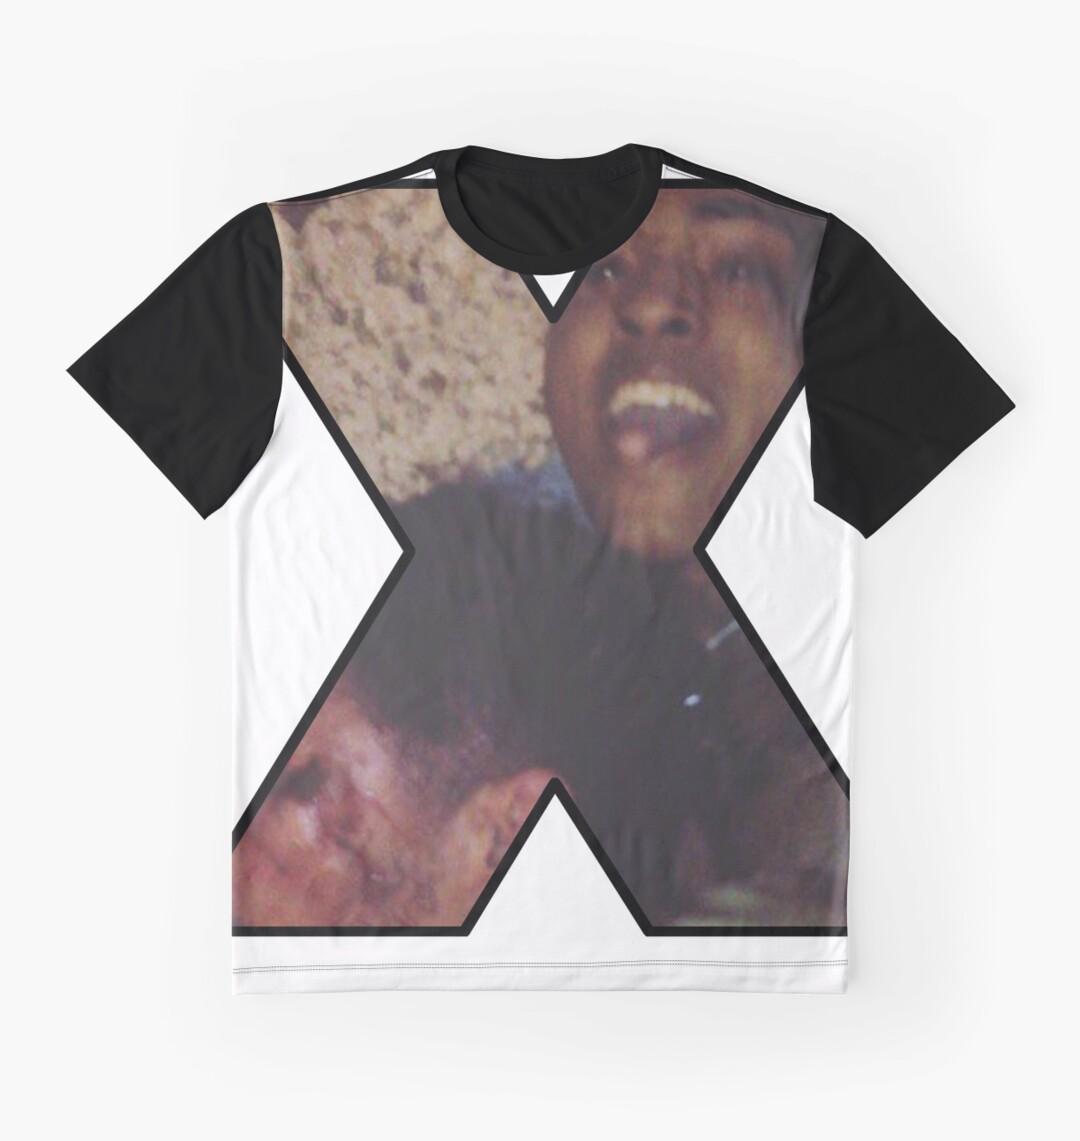 Design shirt redbubble - Xxxtentacion Yung Bratz X Design